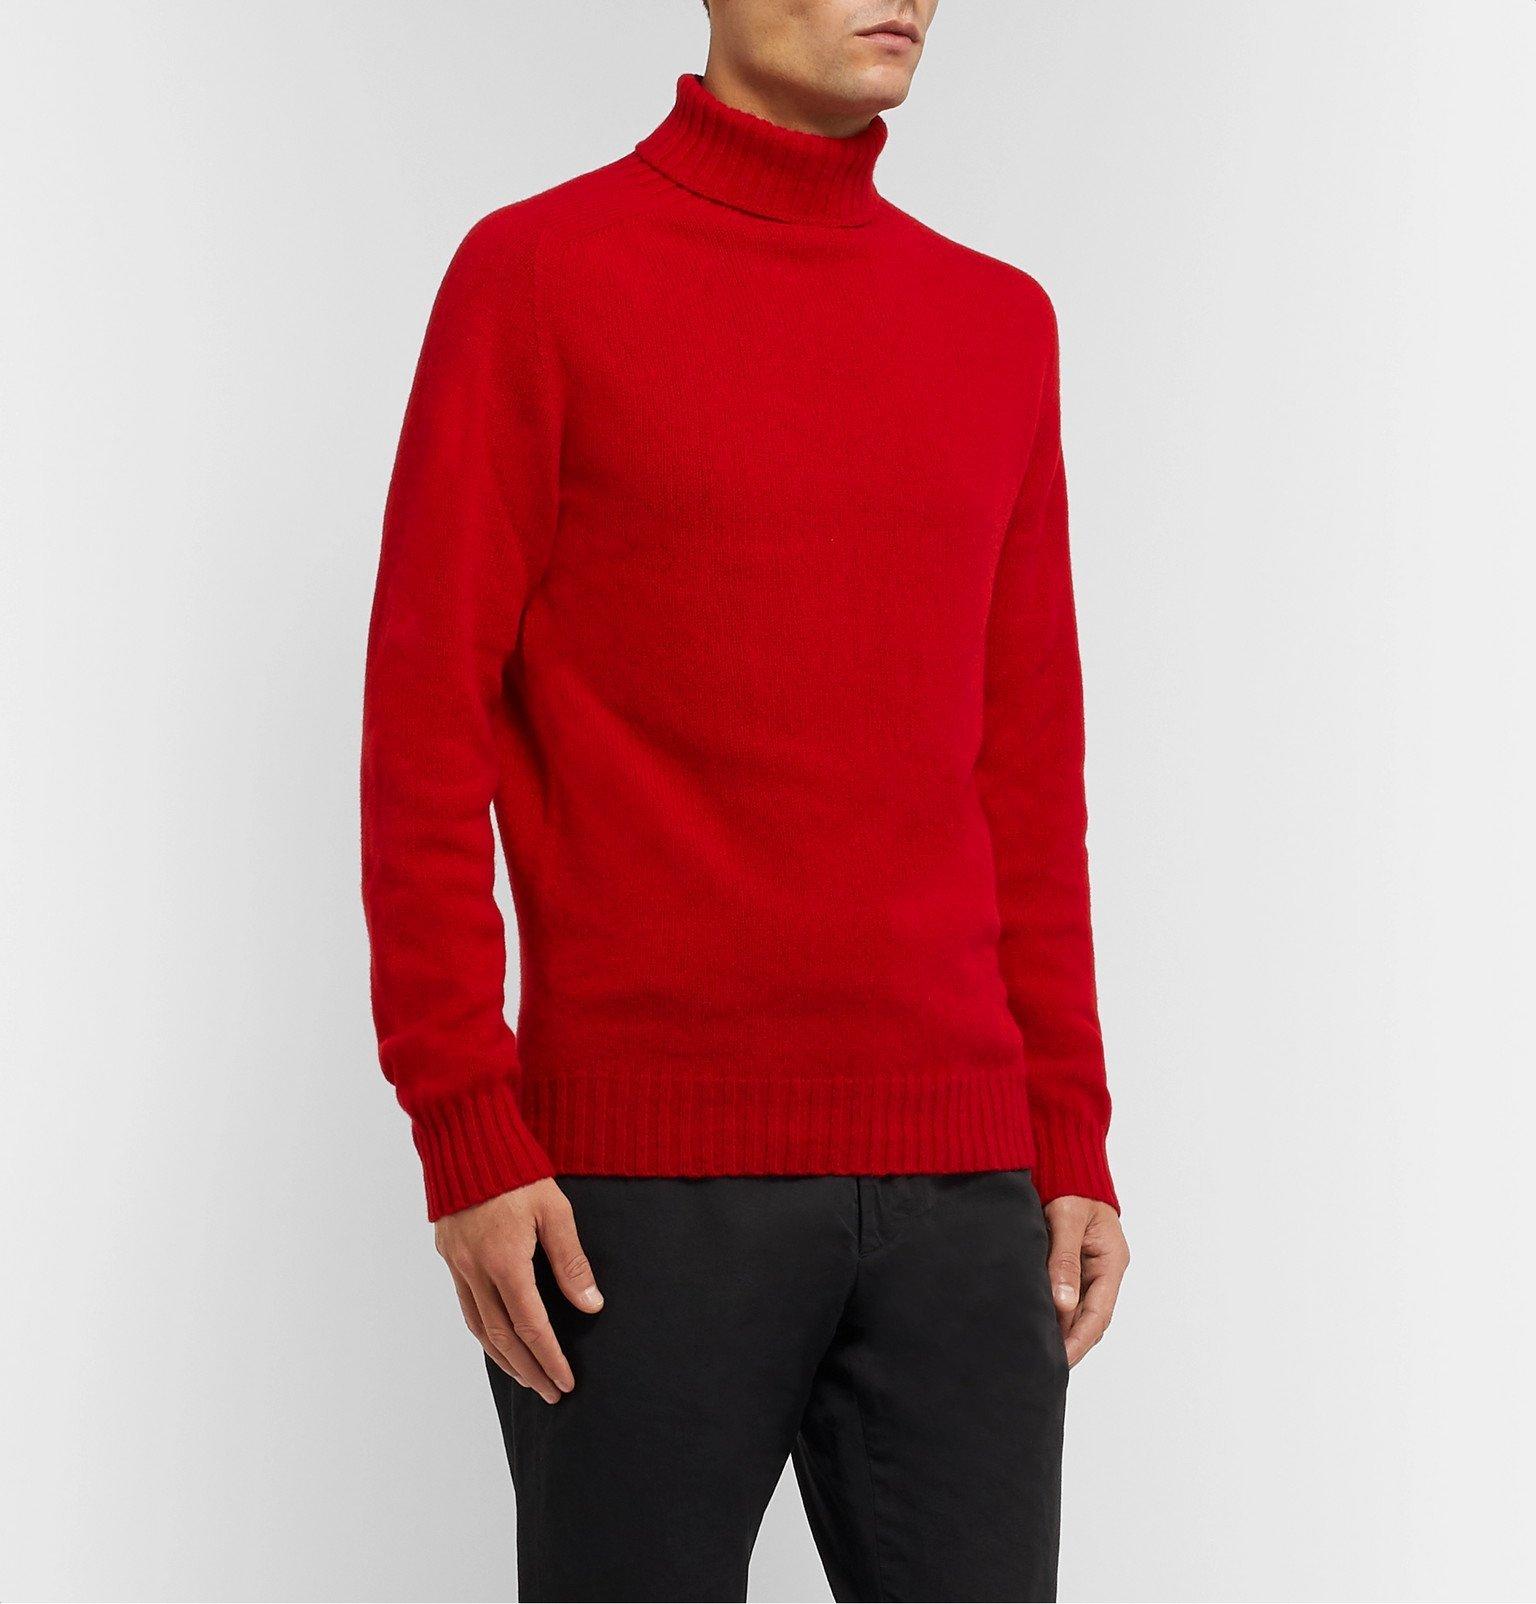 Officine Generale - Wool Rollneck Sweater - Red